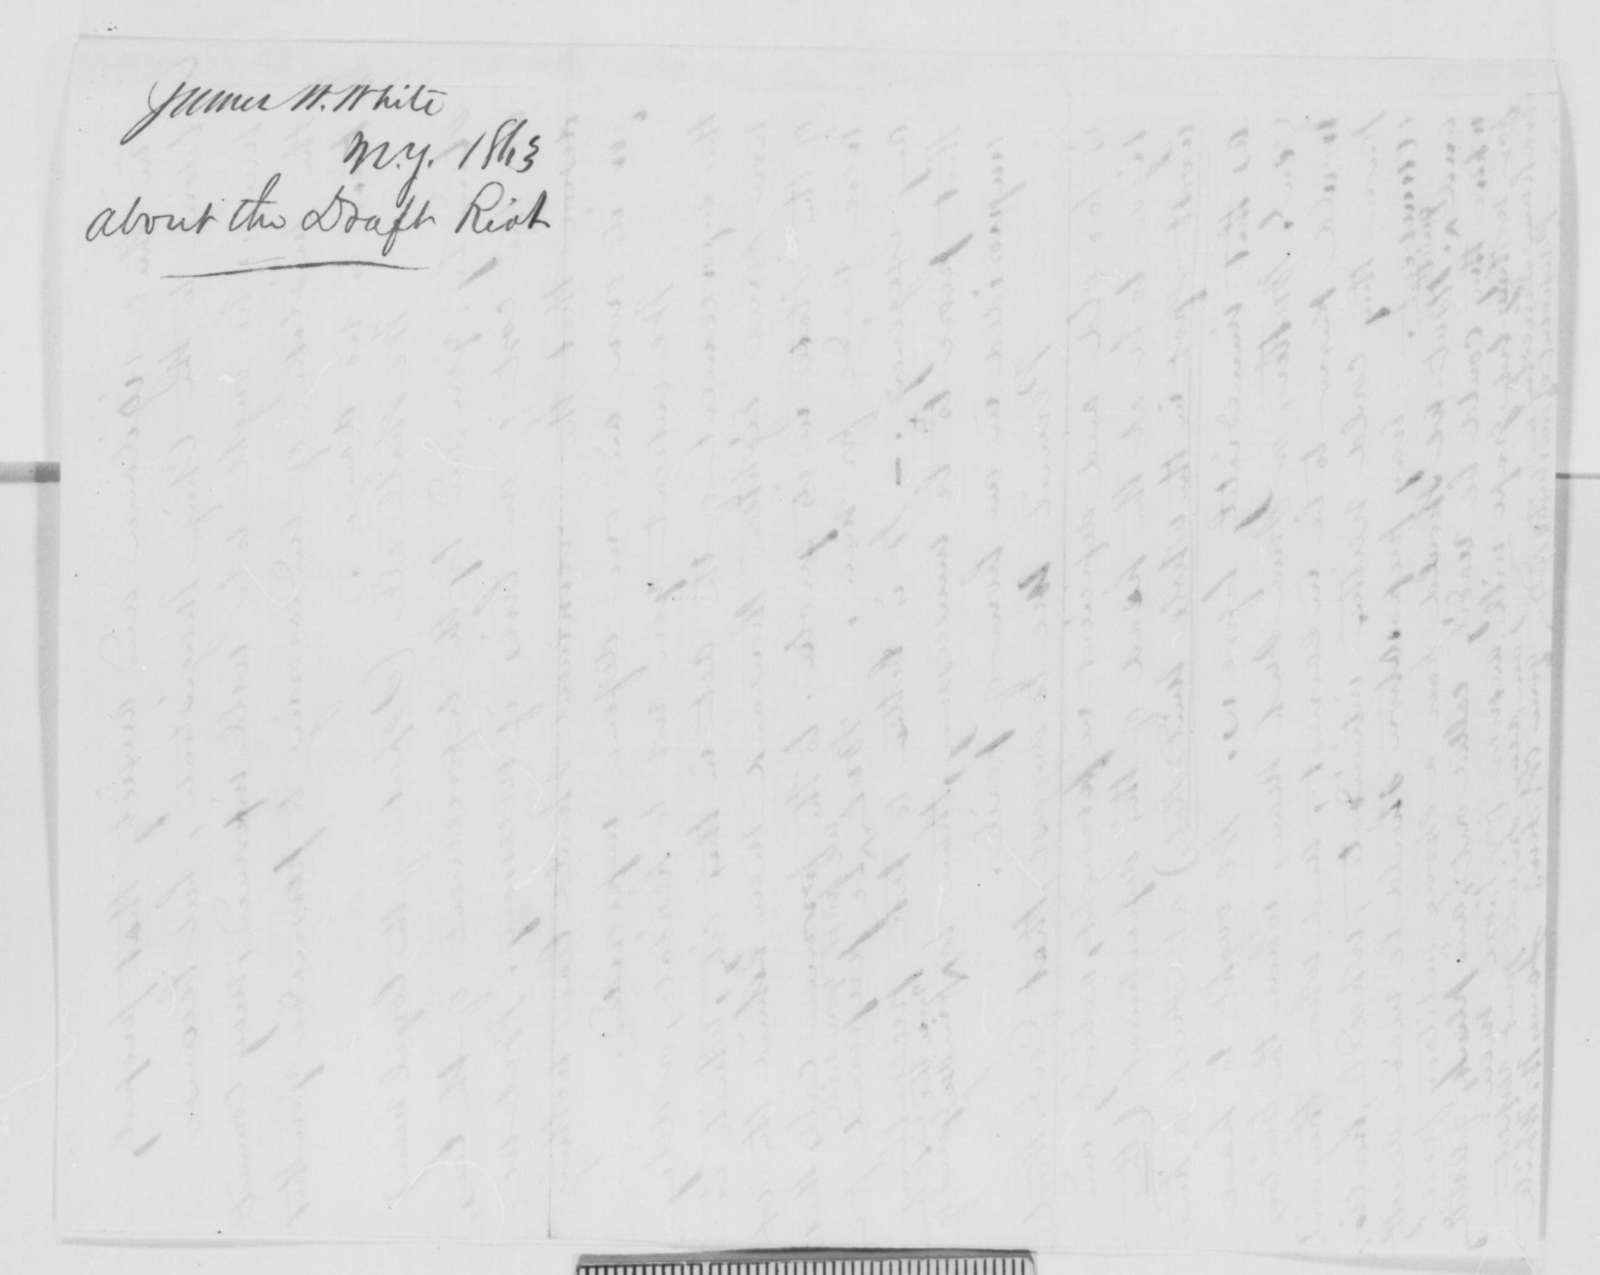 James W. White to Abraham Lincoln, Thursday, April 02, 1863  (Draft resistance in New York)